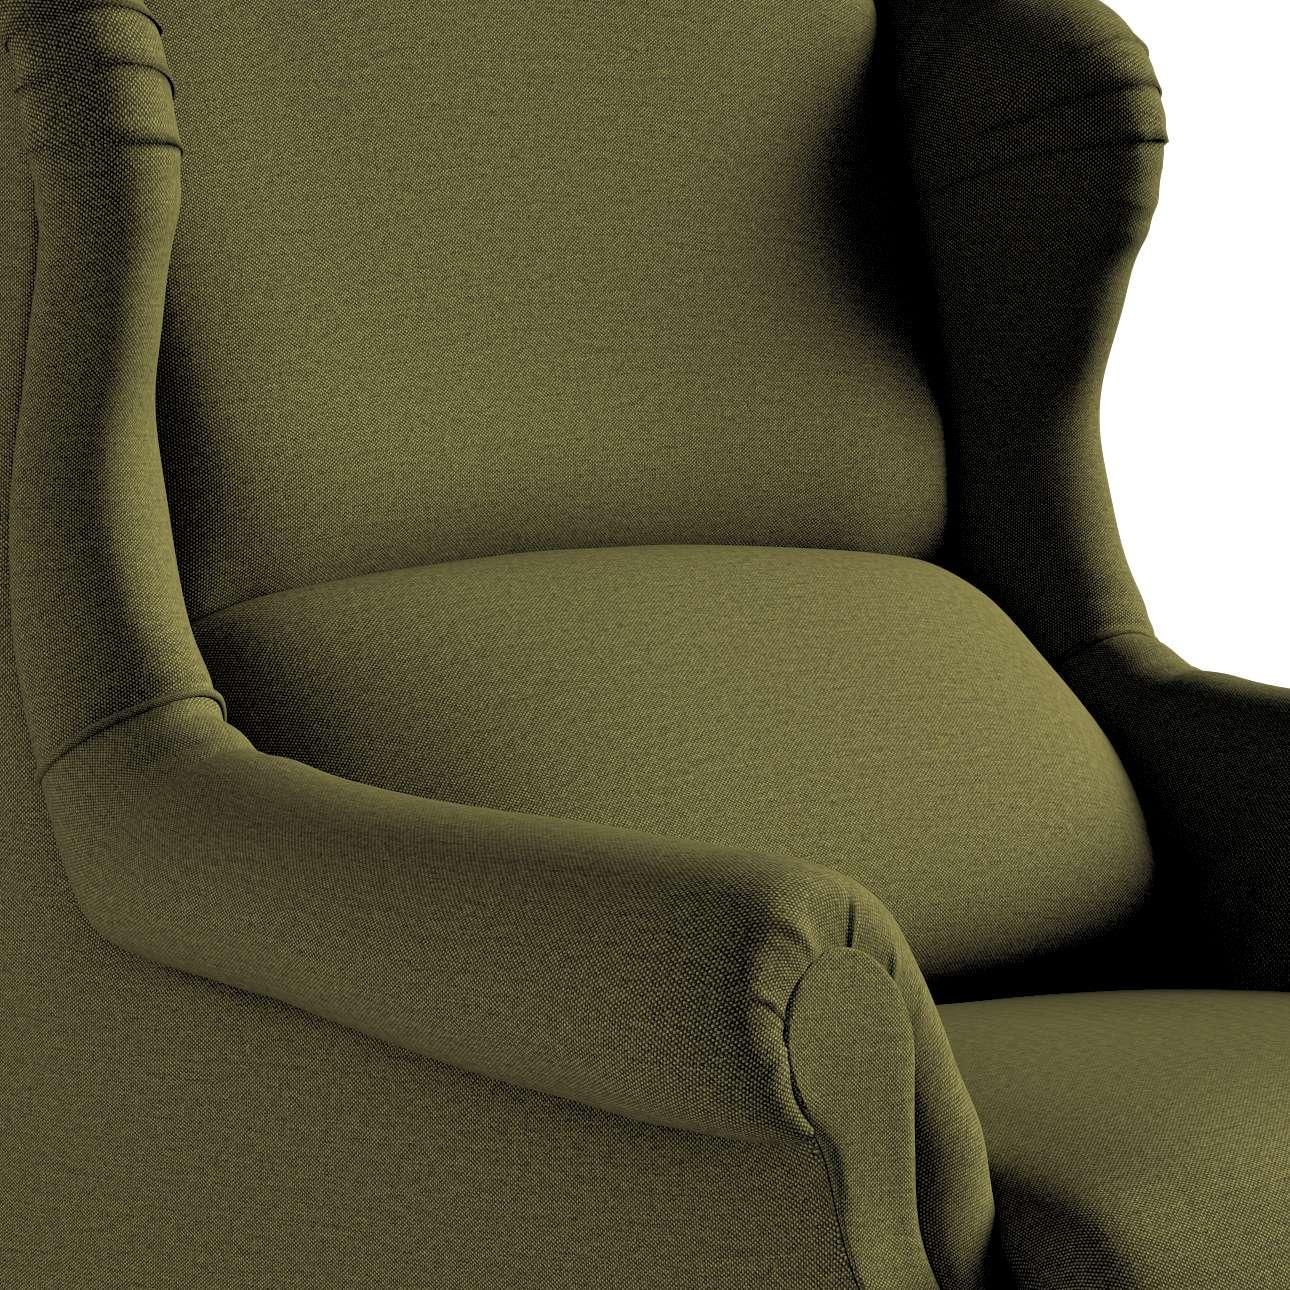 Fotel Unique w kolekcji Etna, tkanina: 161-26